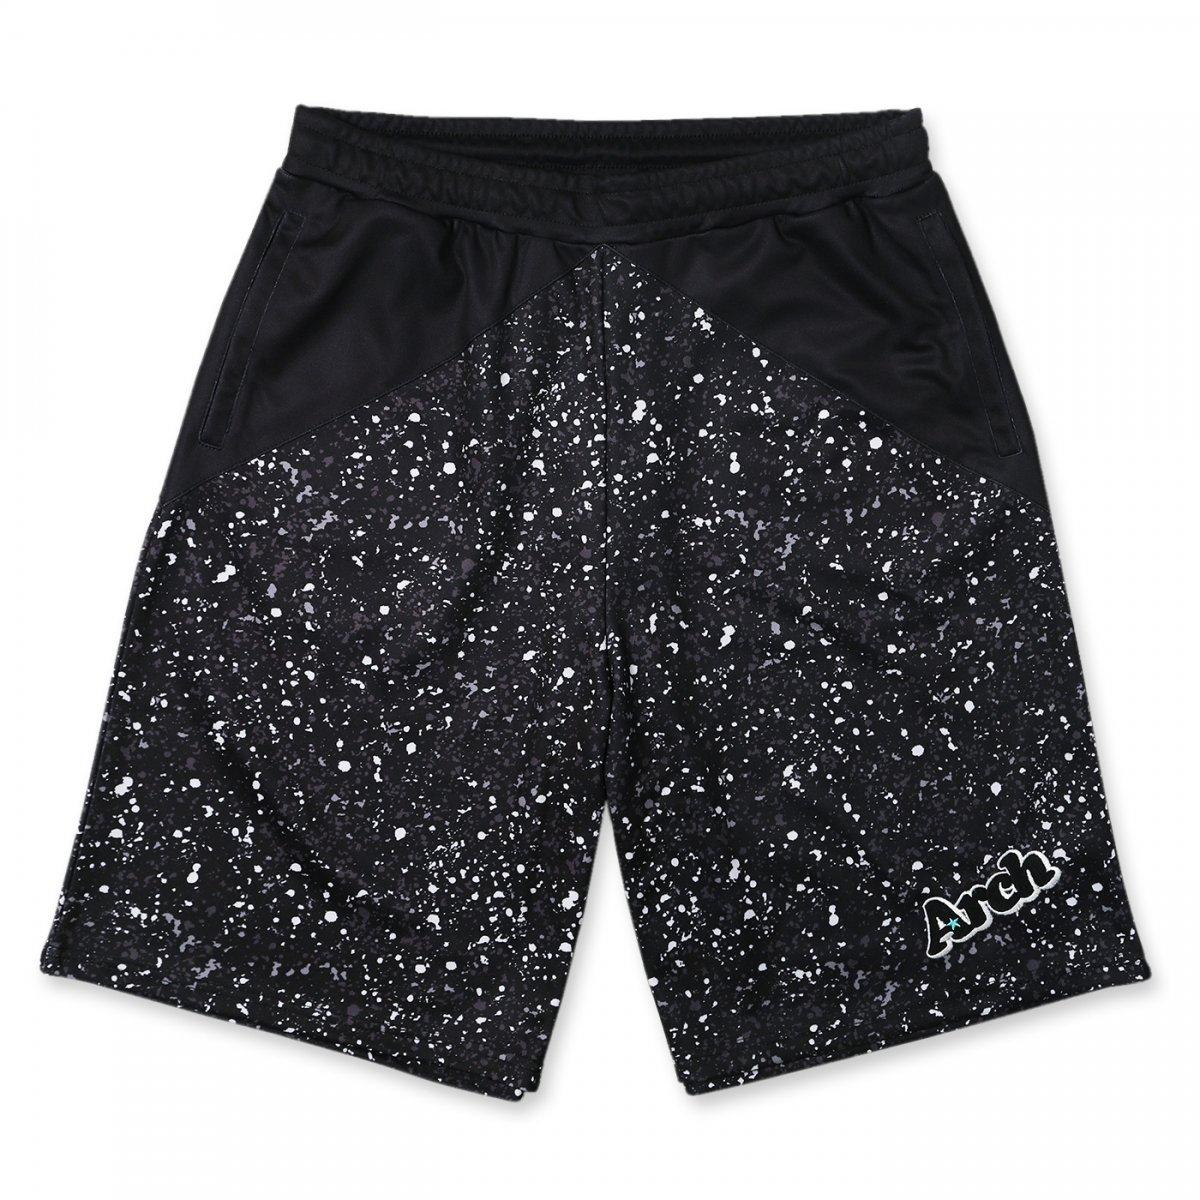 paint splatter shorts【black】